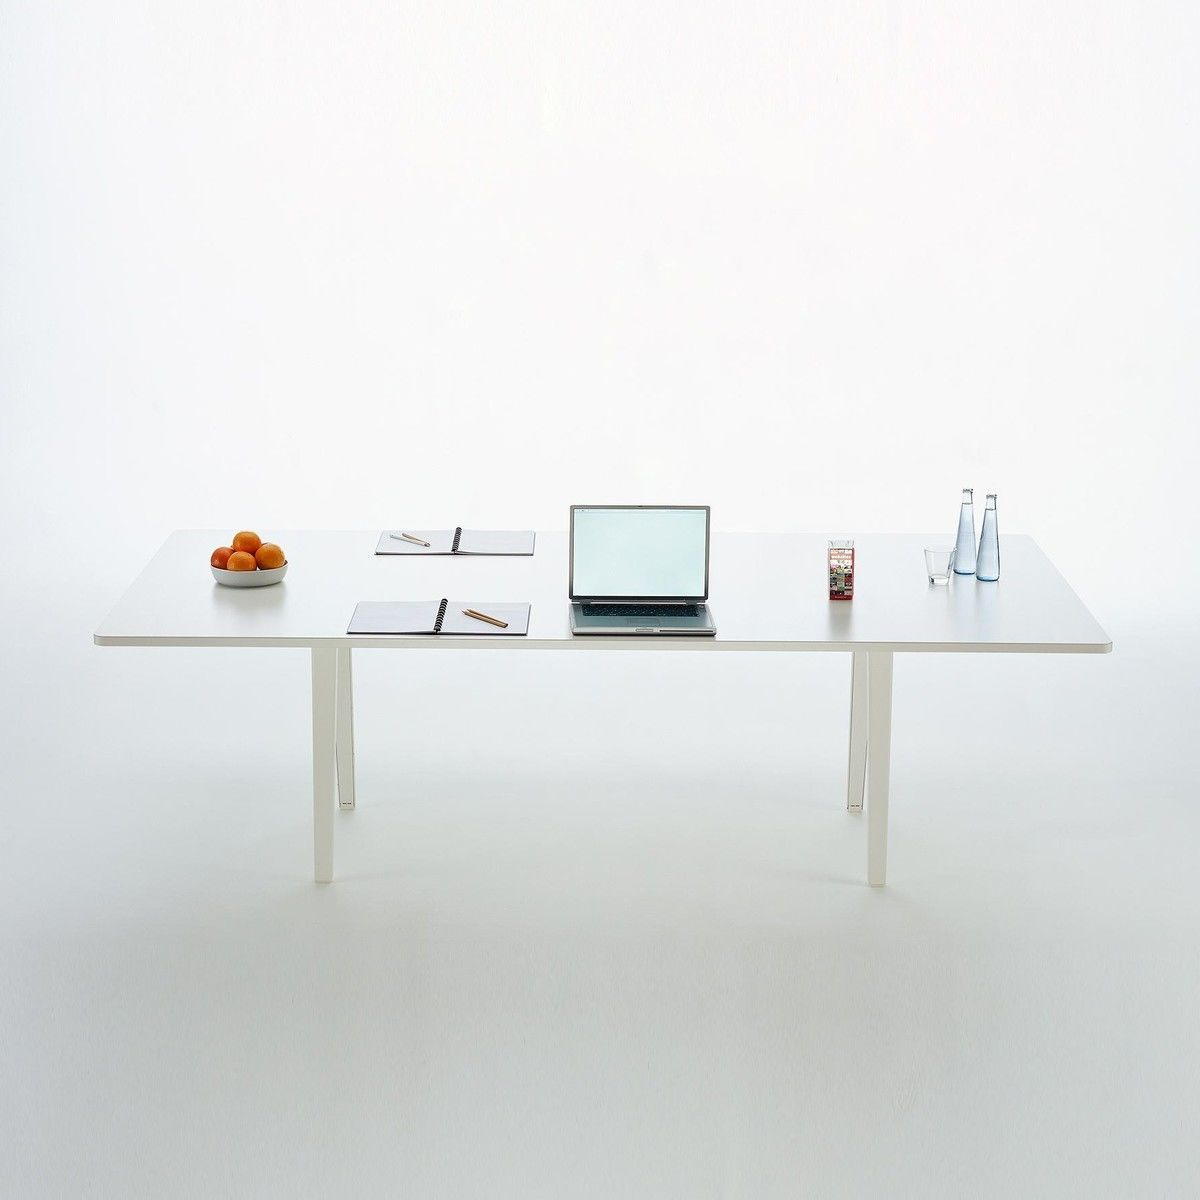 Joyn Single Bench Table Vitra AmbienteDirectcom : none1200x1200 ID416031 070fc21332b278bf2ce0e0675c9c5c6f from www.ambientedirect.com size 1200 x 1200 jpeg 71kB